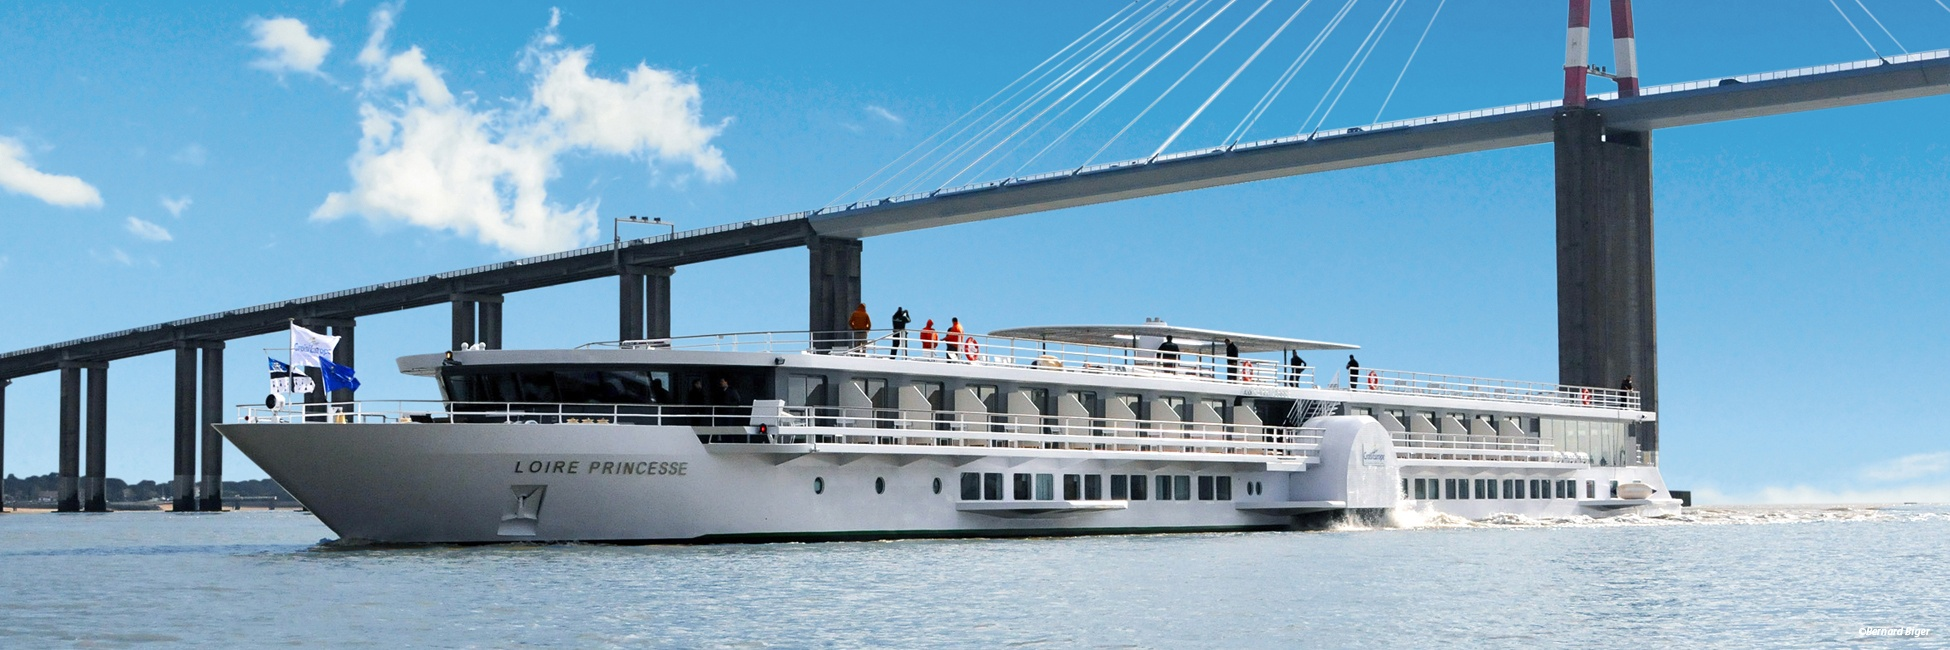 MS Loire Princesse, navire 5 ancres